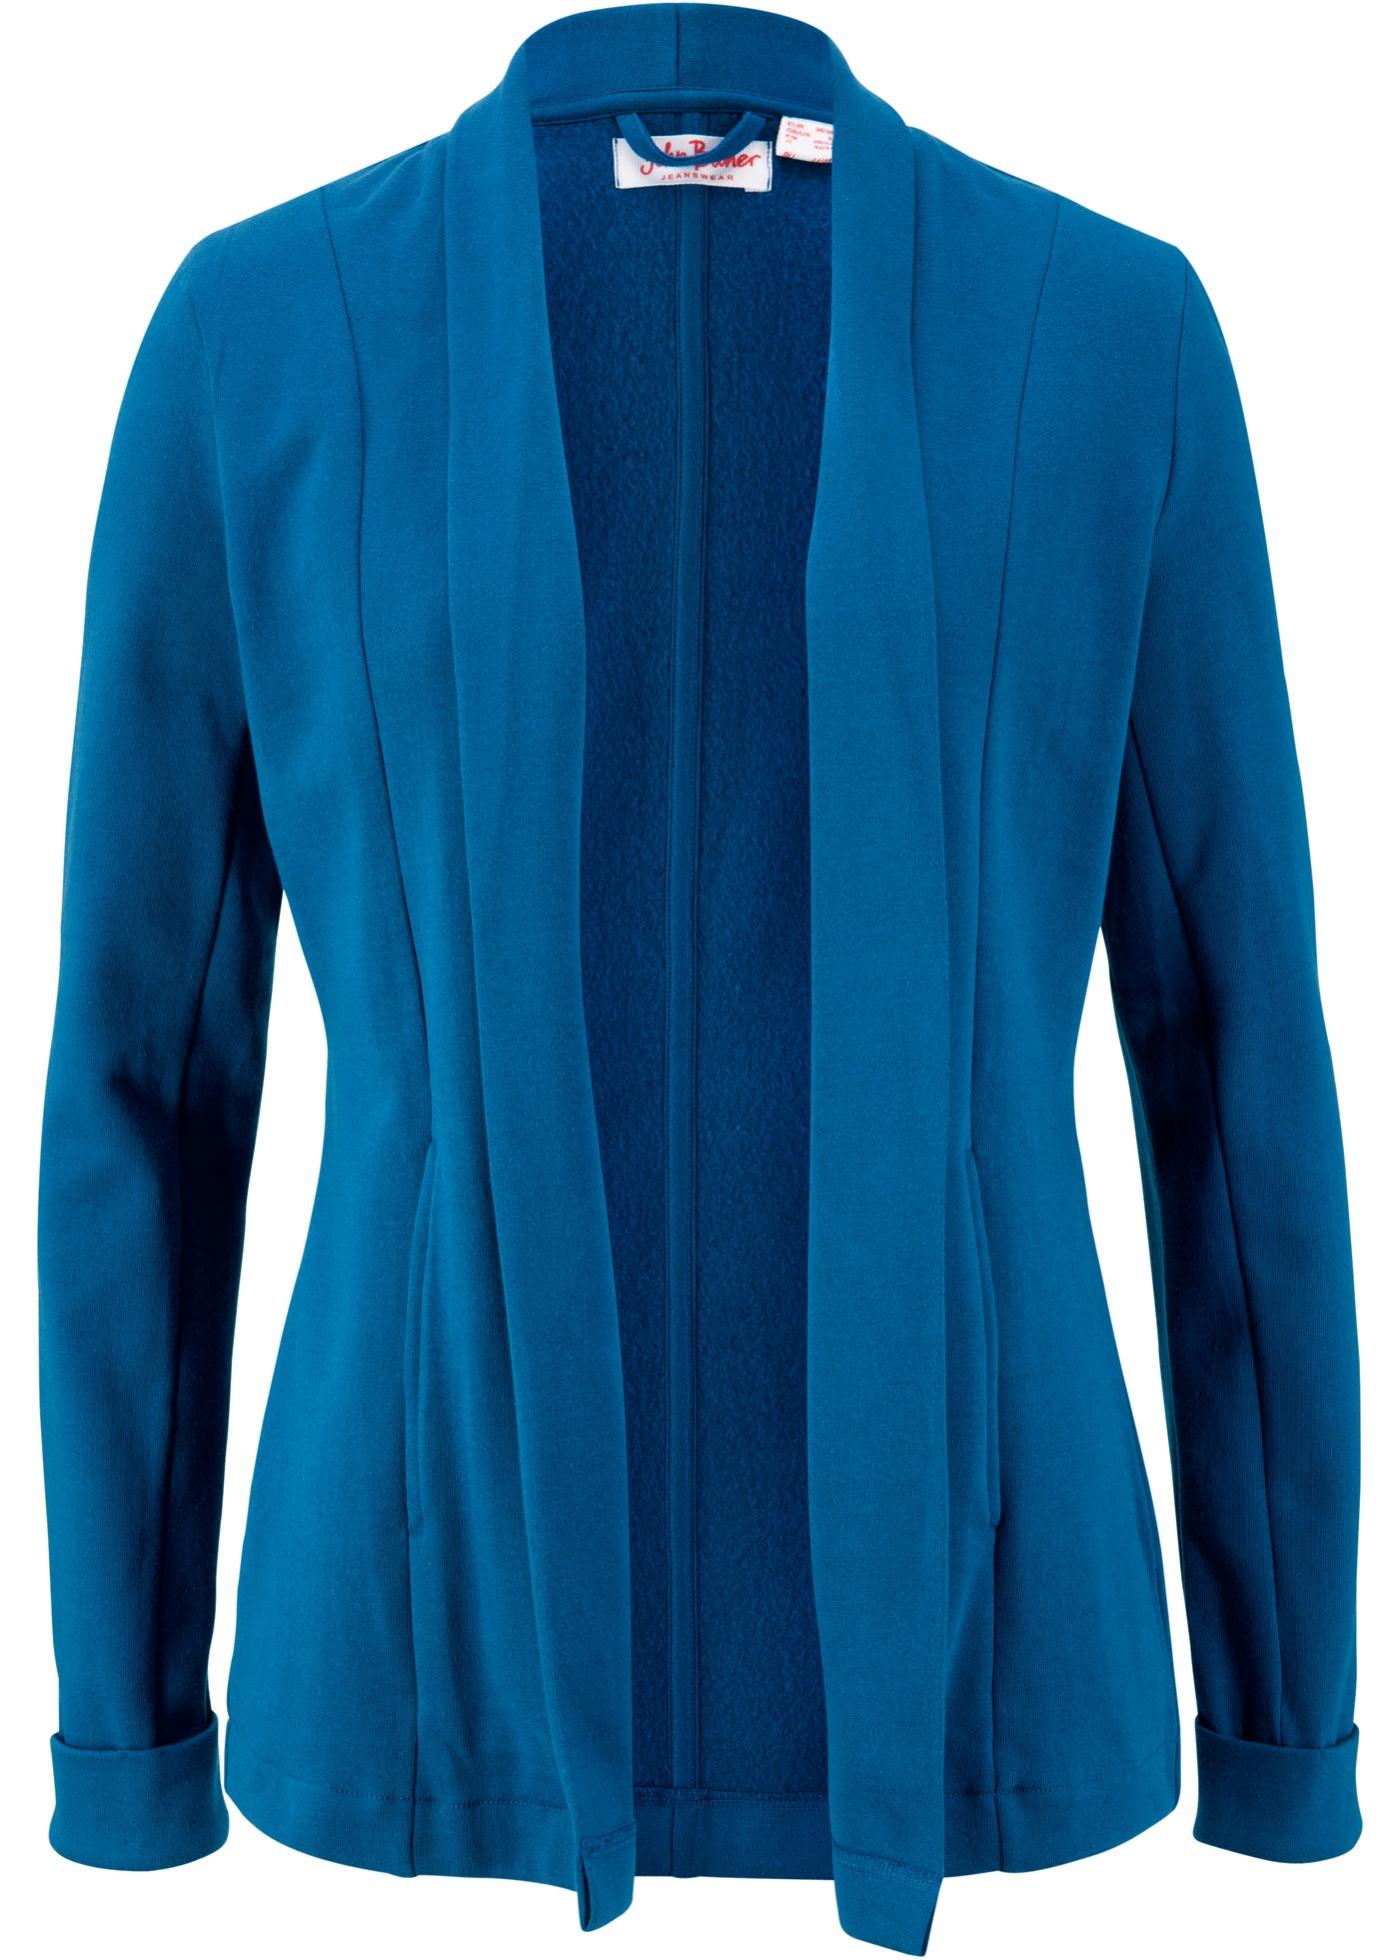 Blazer di felpa in cotone biologico (Blu) - John Baner JEANSWEAR